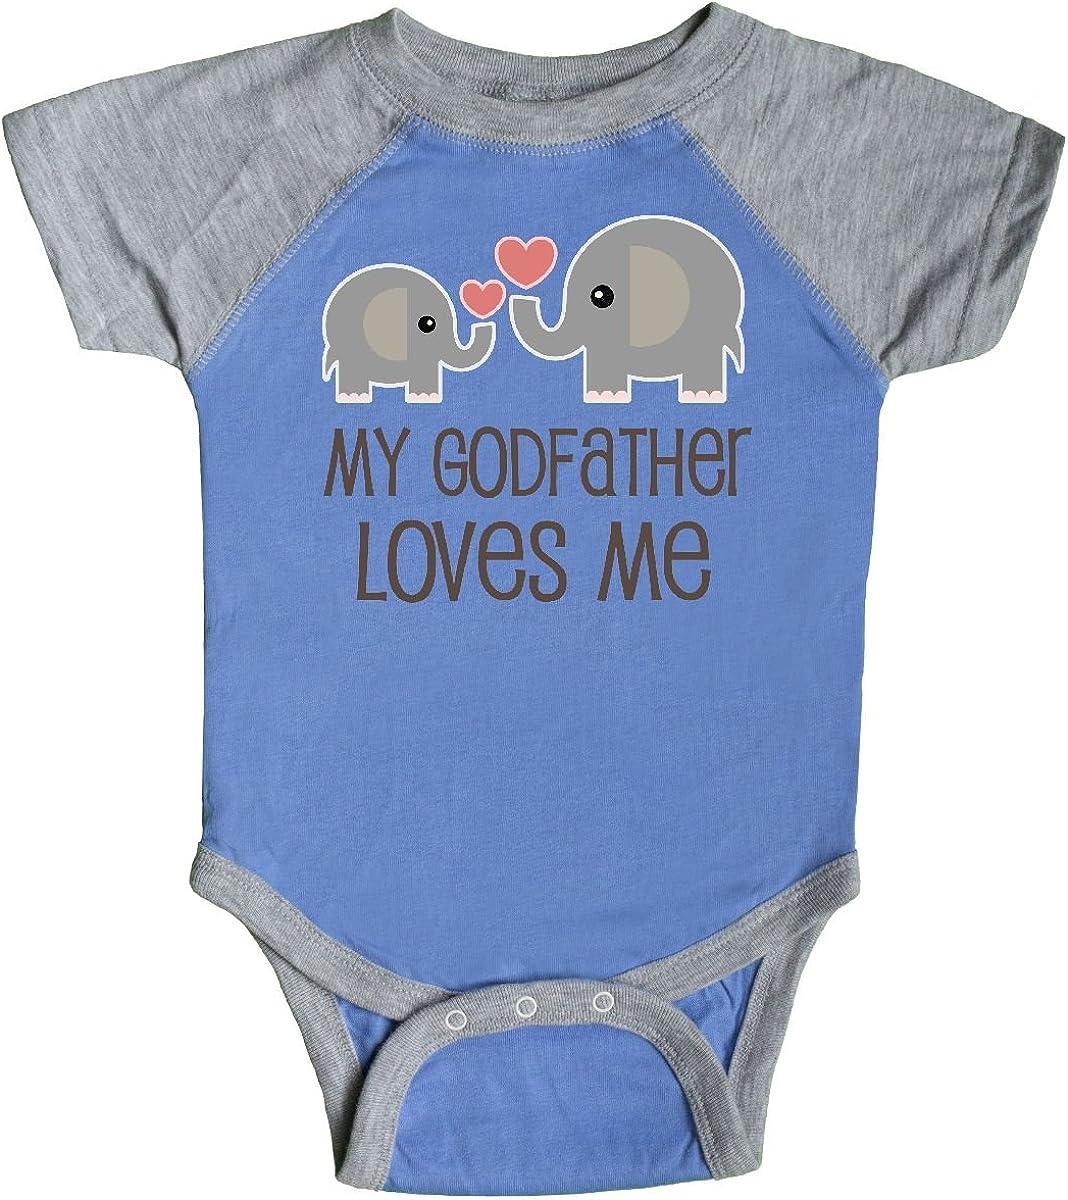 My Godfather in Wyoming Loves Me Toddler//Kids Sweatshirt